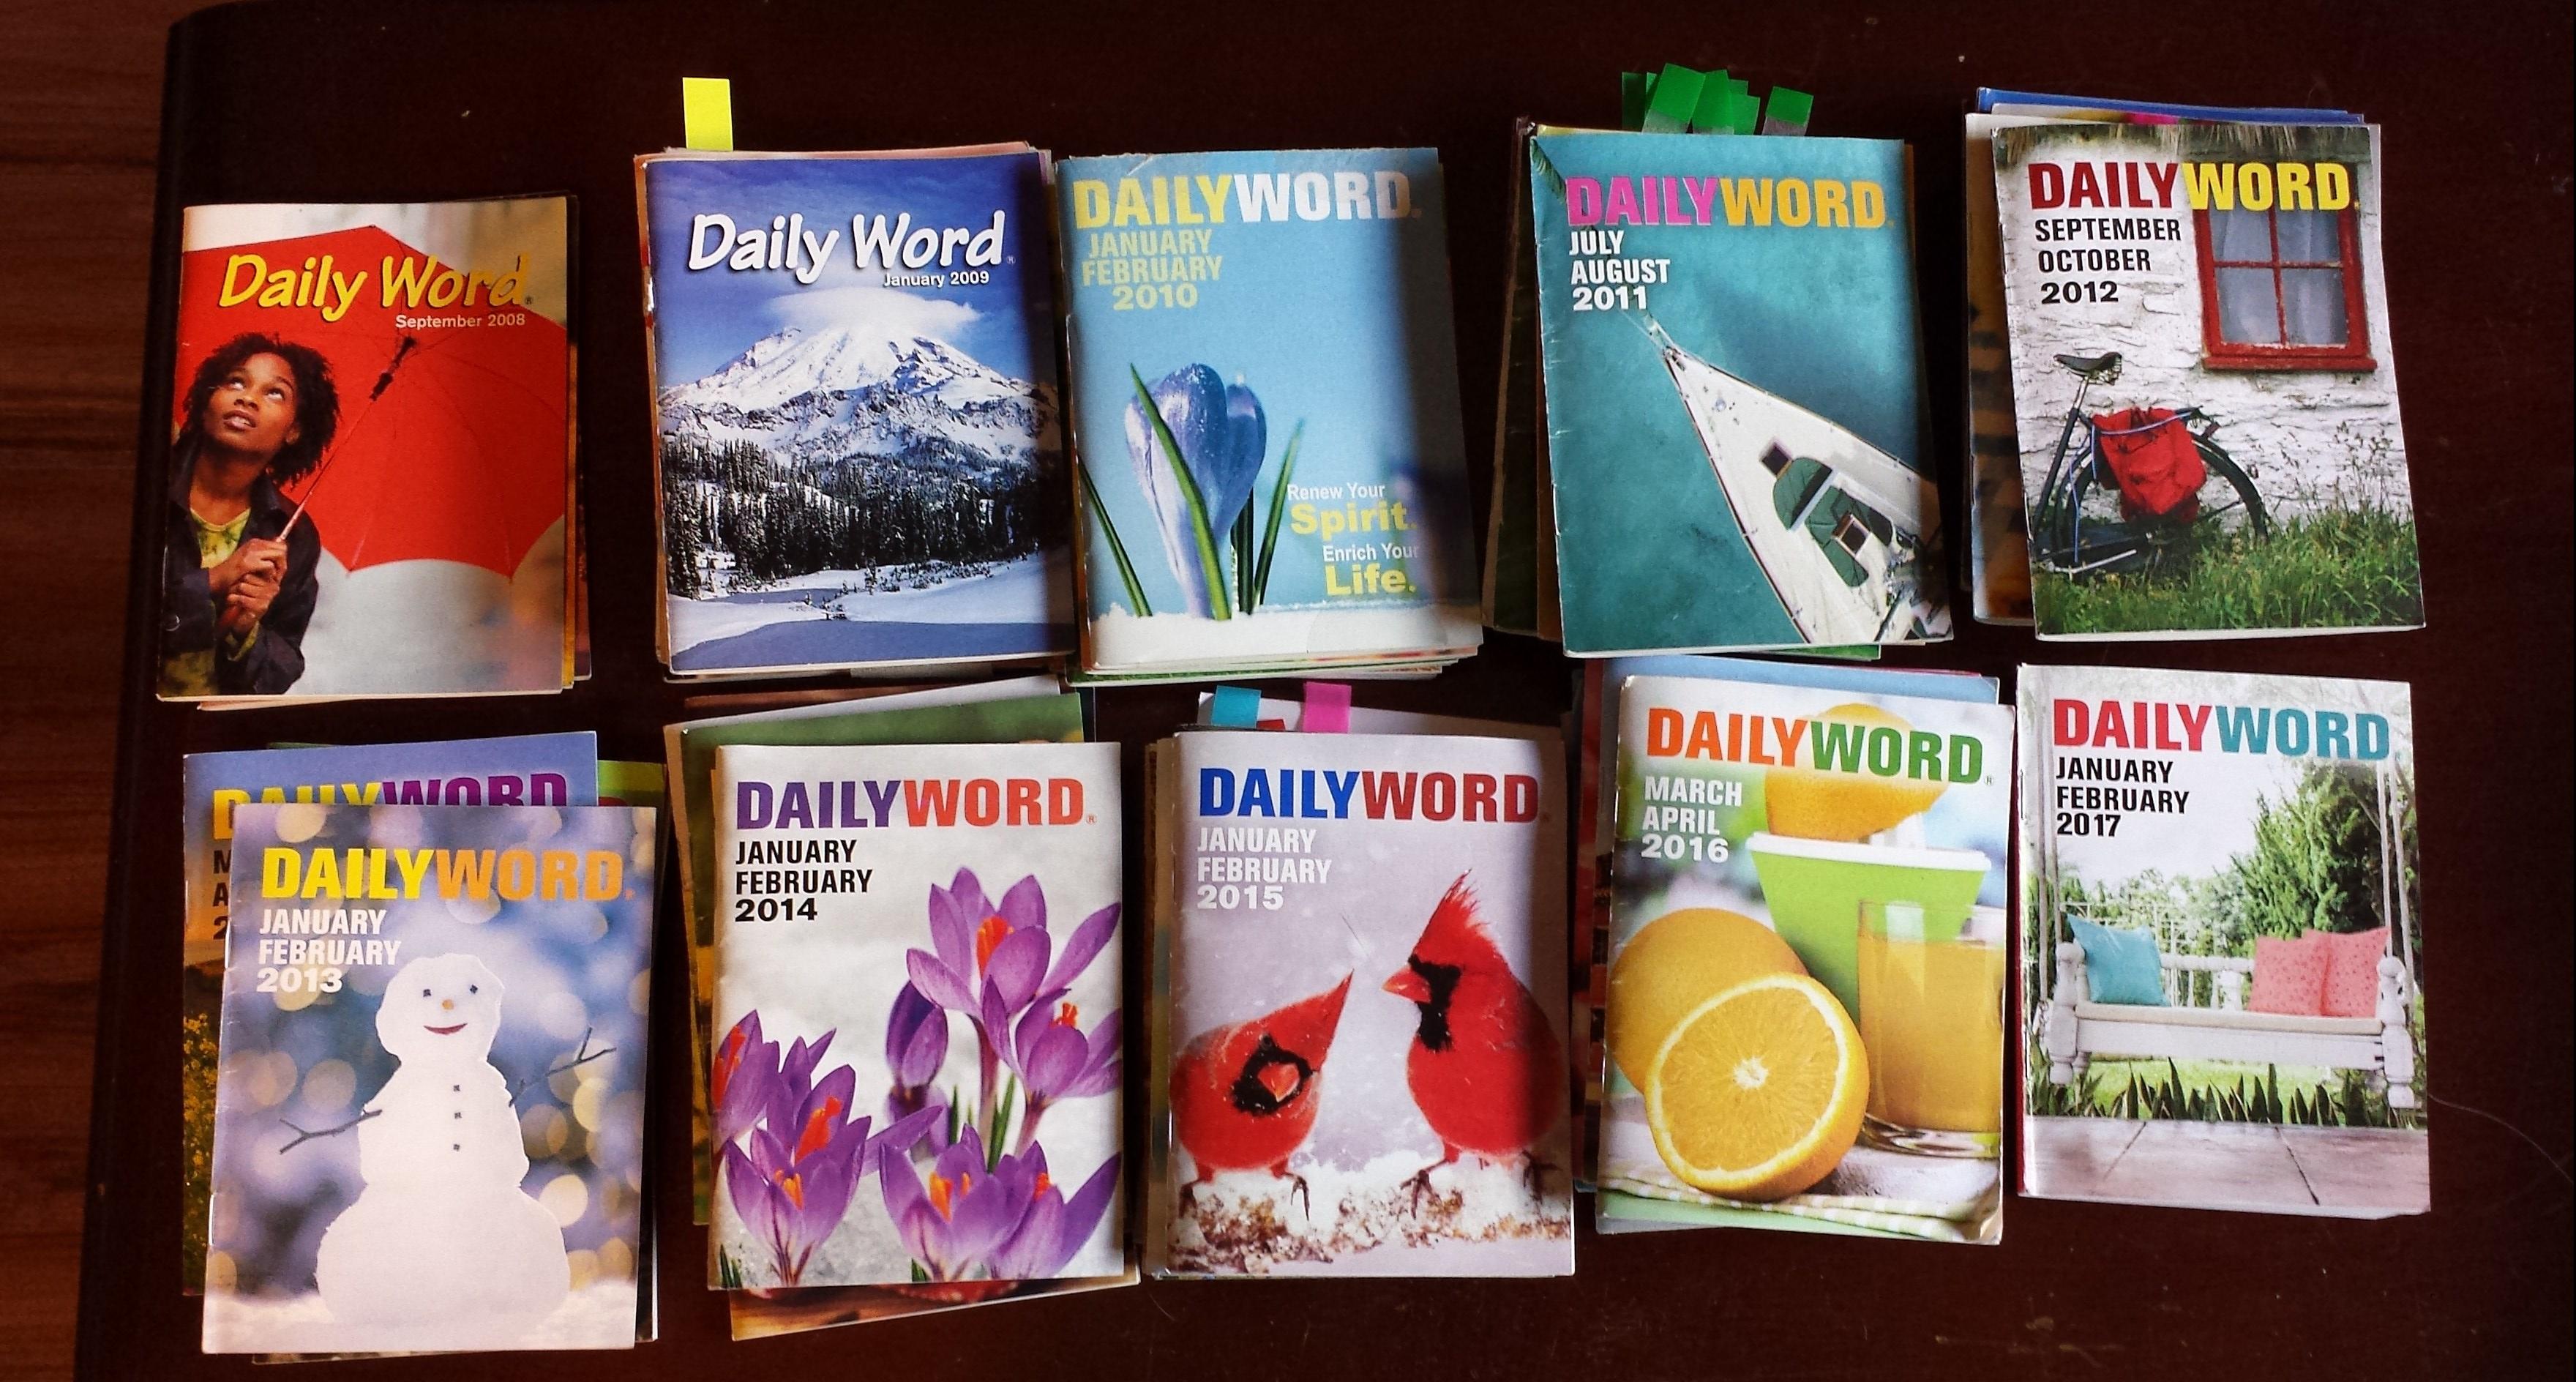 daily-word-2008-date-2017-03-06-07-54-38.jpg